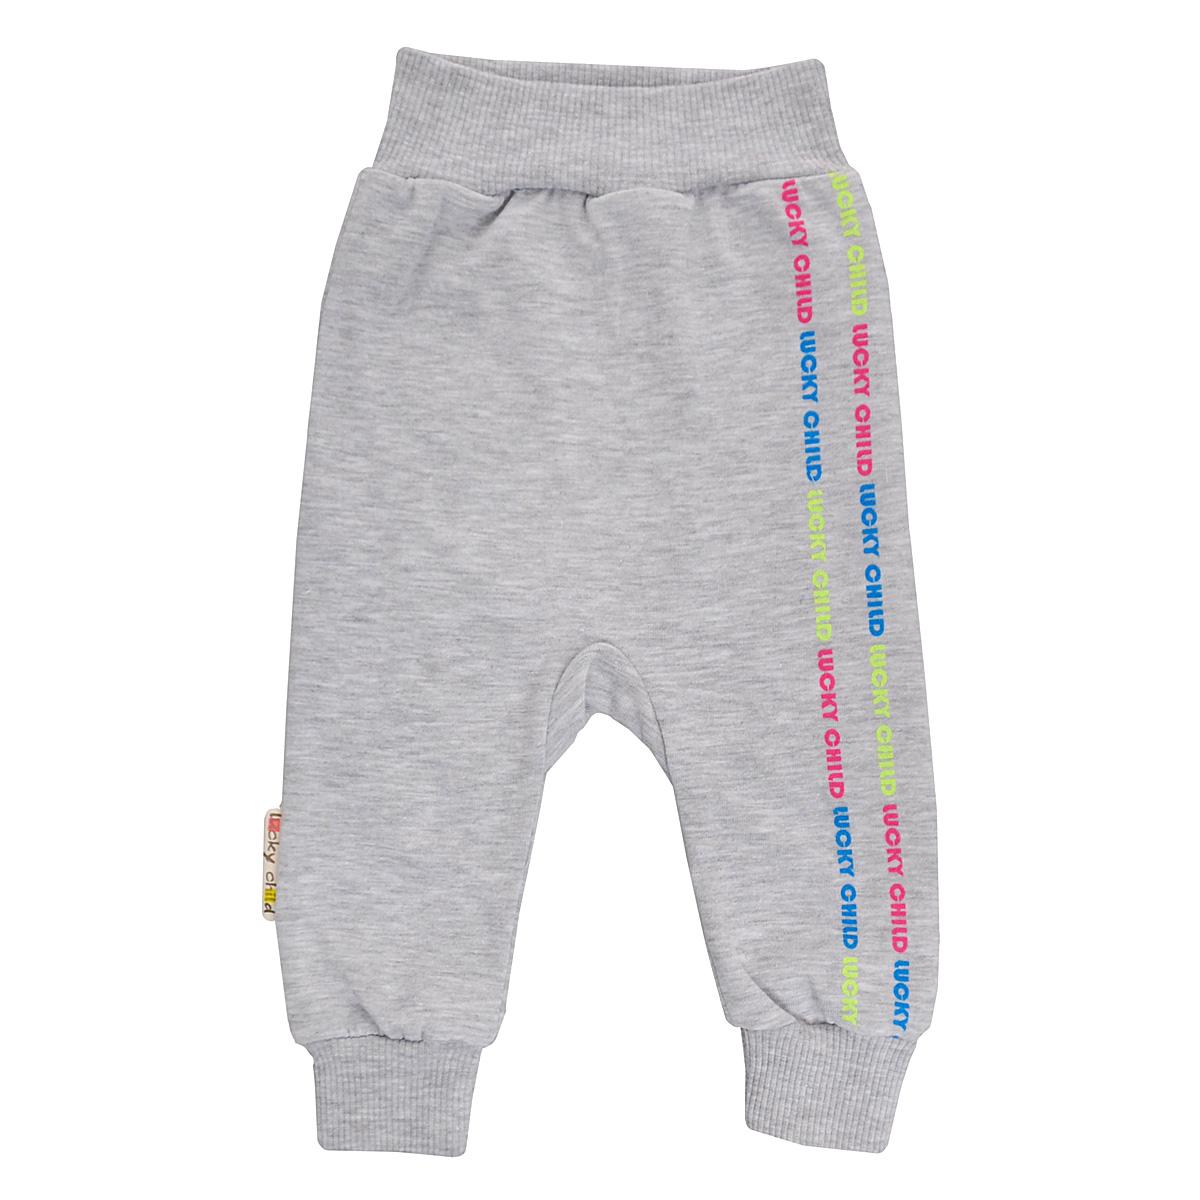 Штанишки на широком поясе Lucky Child, цвет: серый. 1-11. Размер 56/62